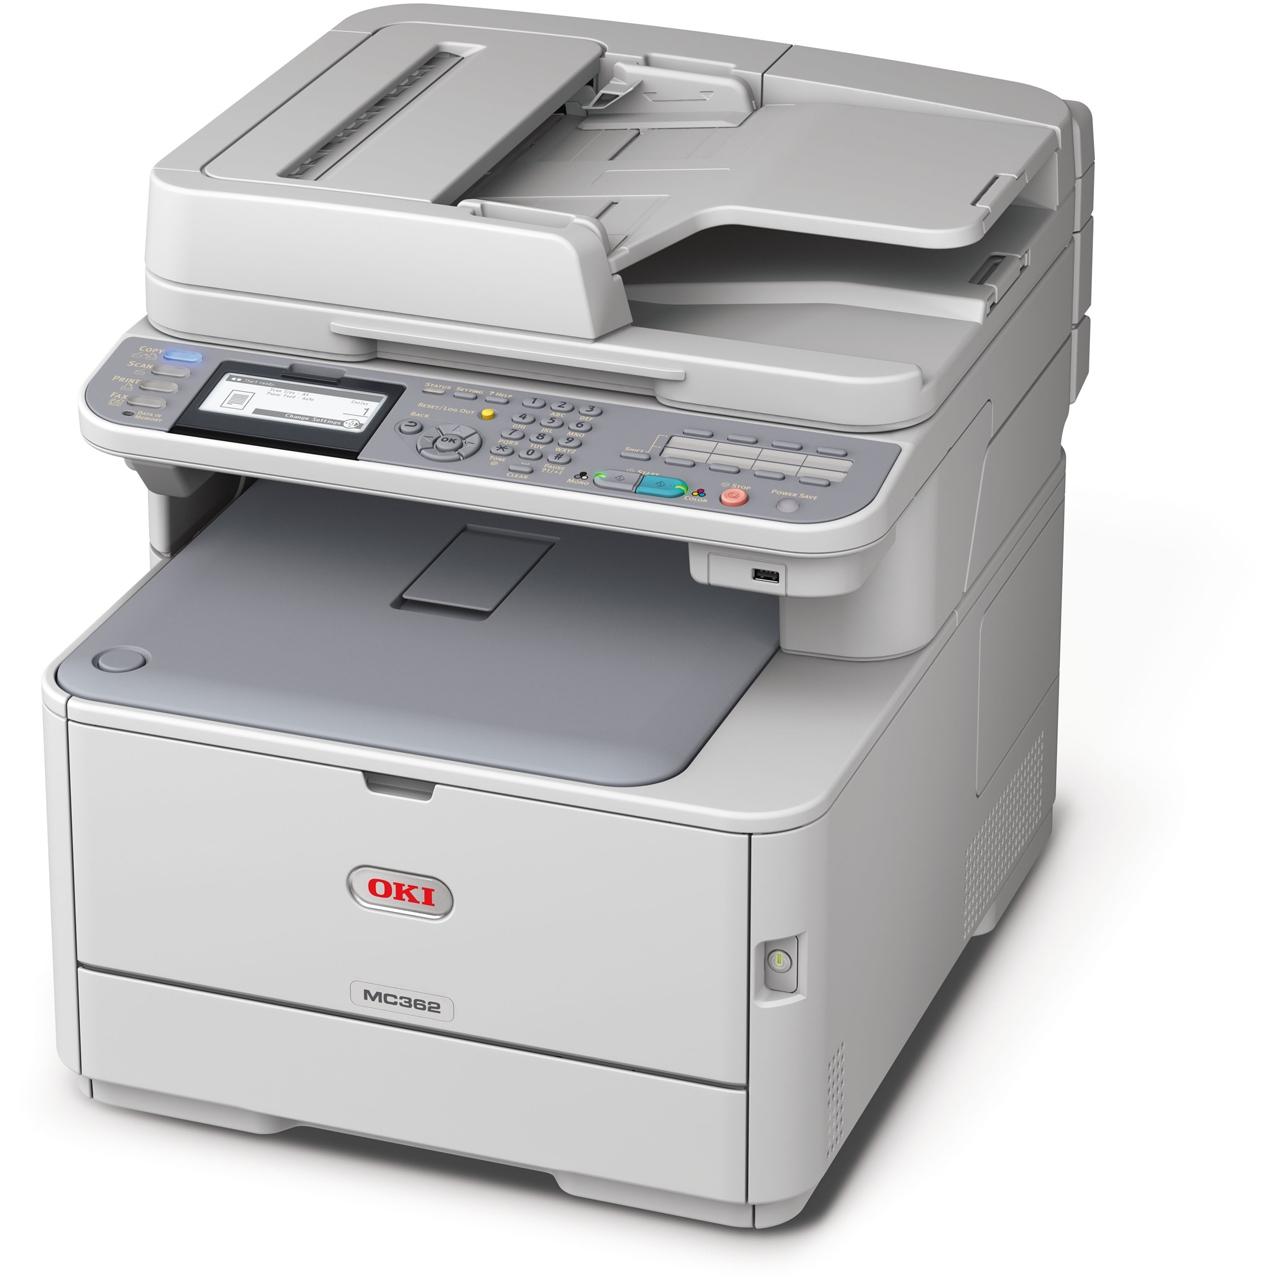 OKI-MC362dn-Duplex-Network-A4-Colour-Laser-Printer